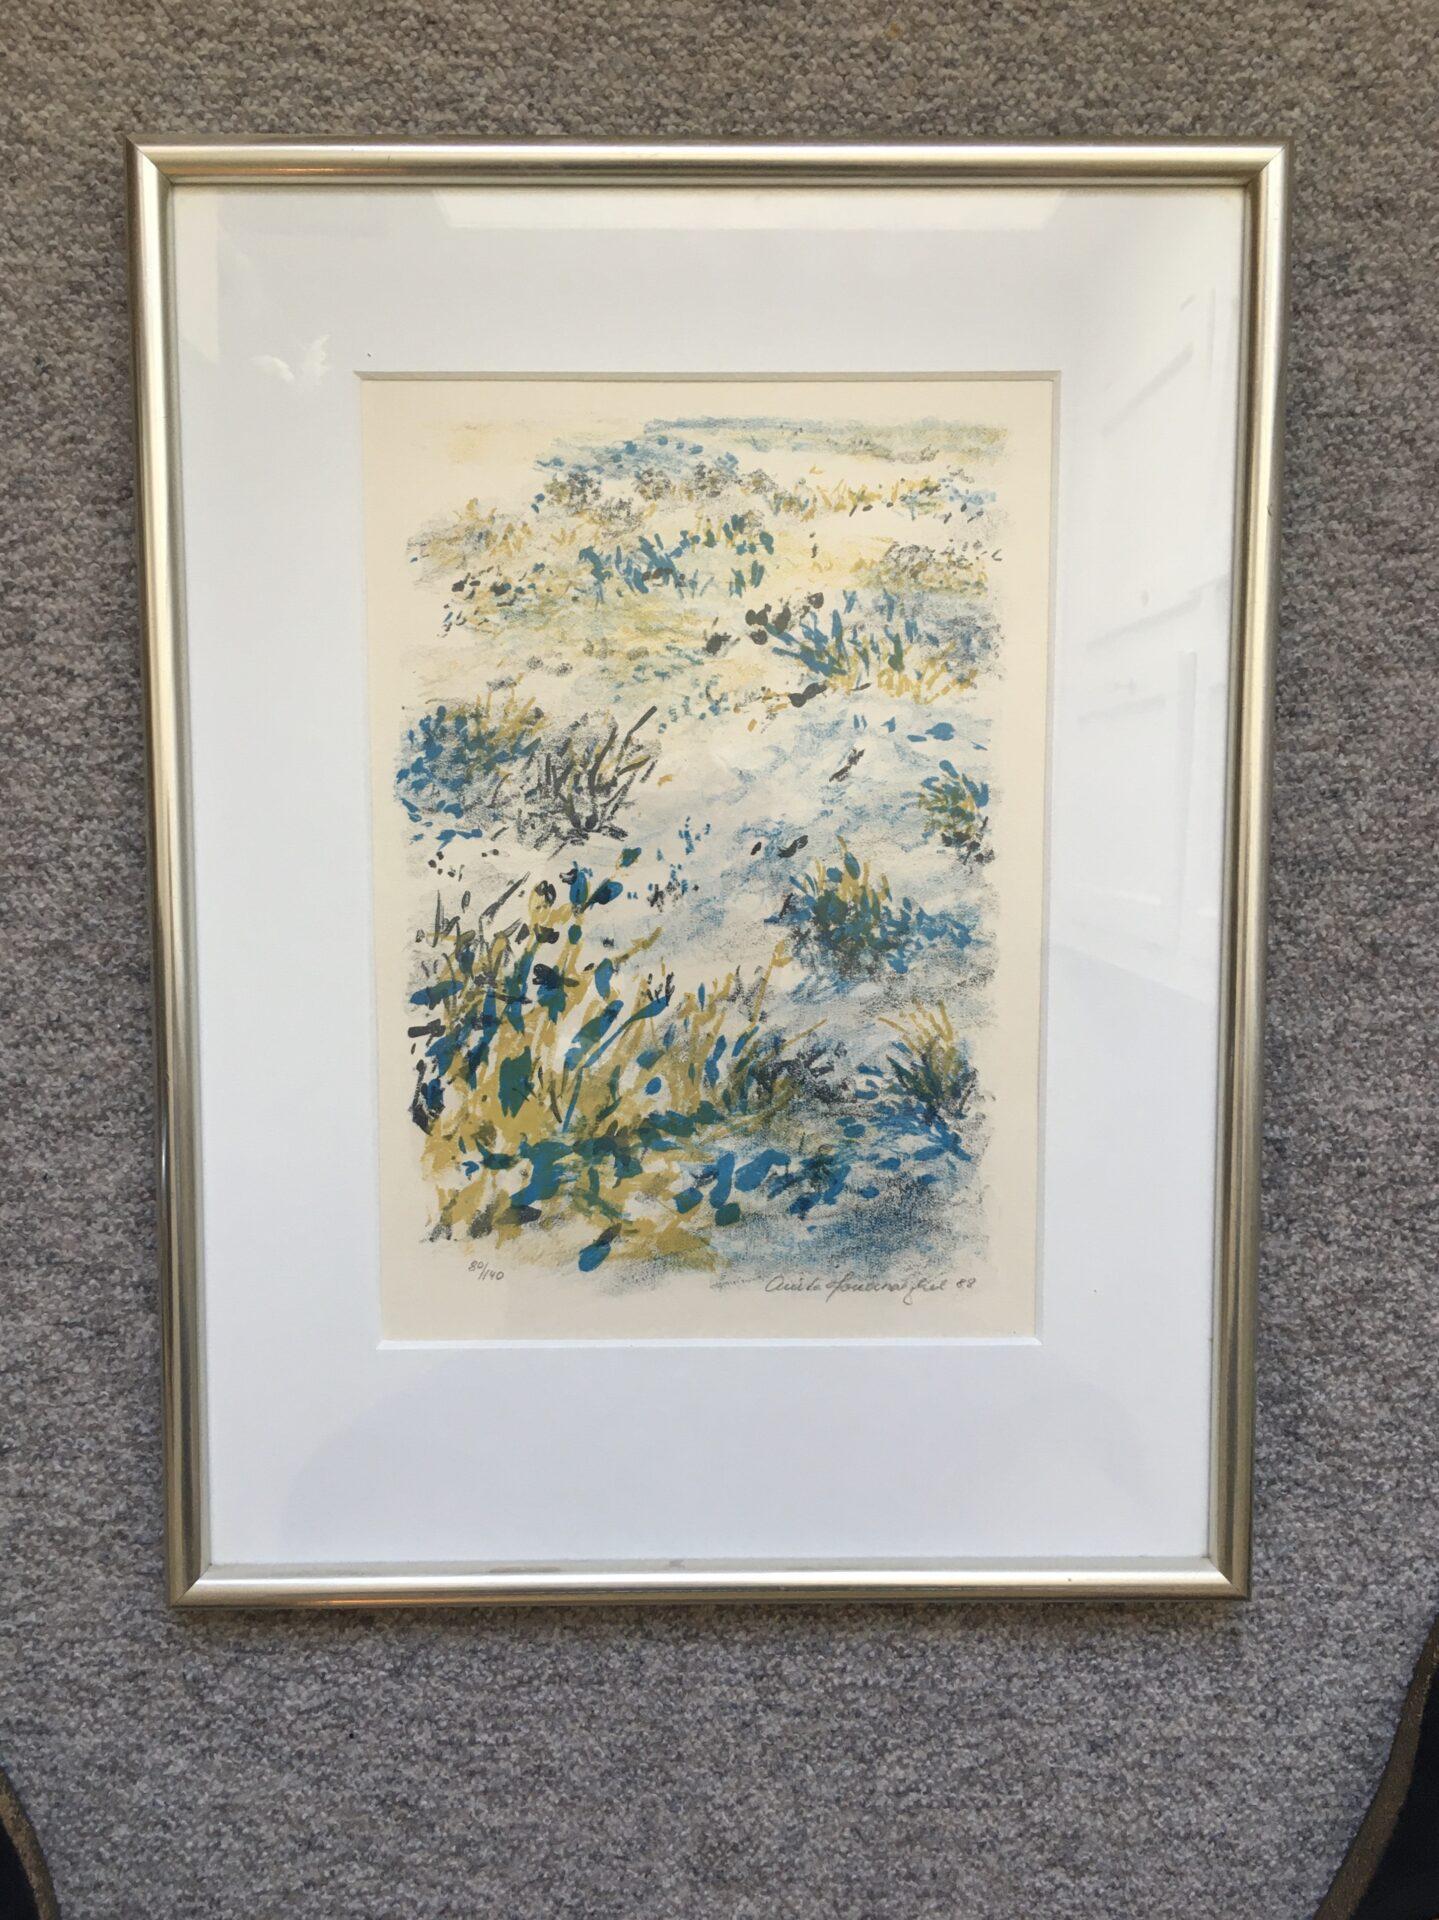 Anita Houvenaeghel, litografi nr 80/140, signeret i 88, rammemål 43x57cm, pris 300kr